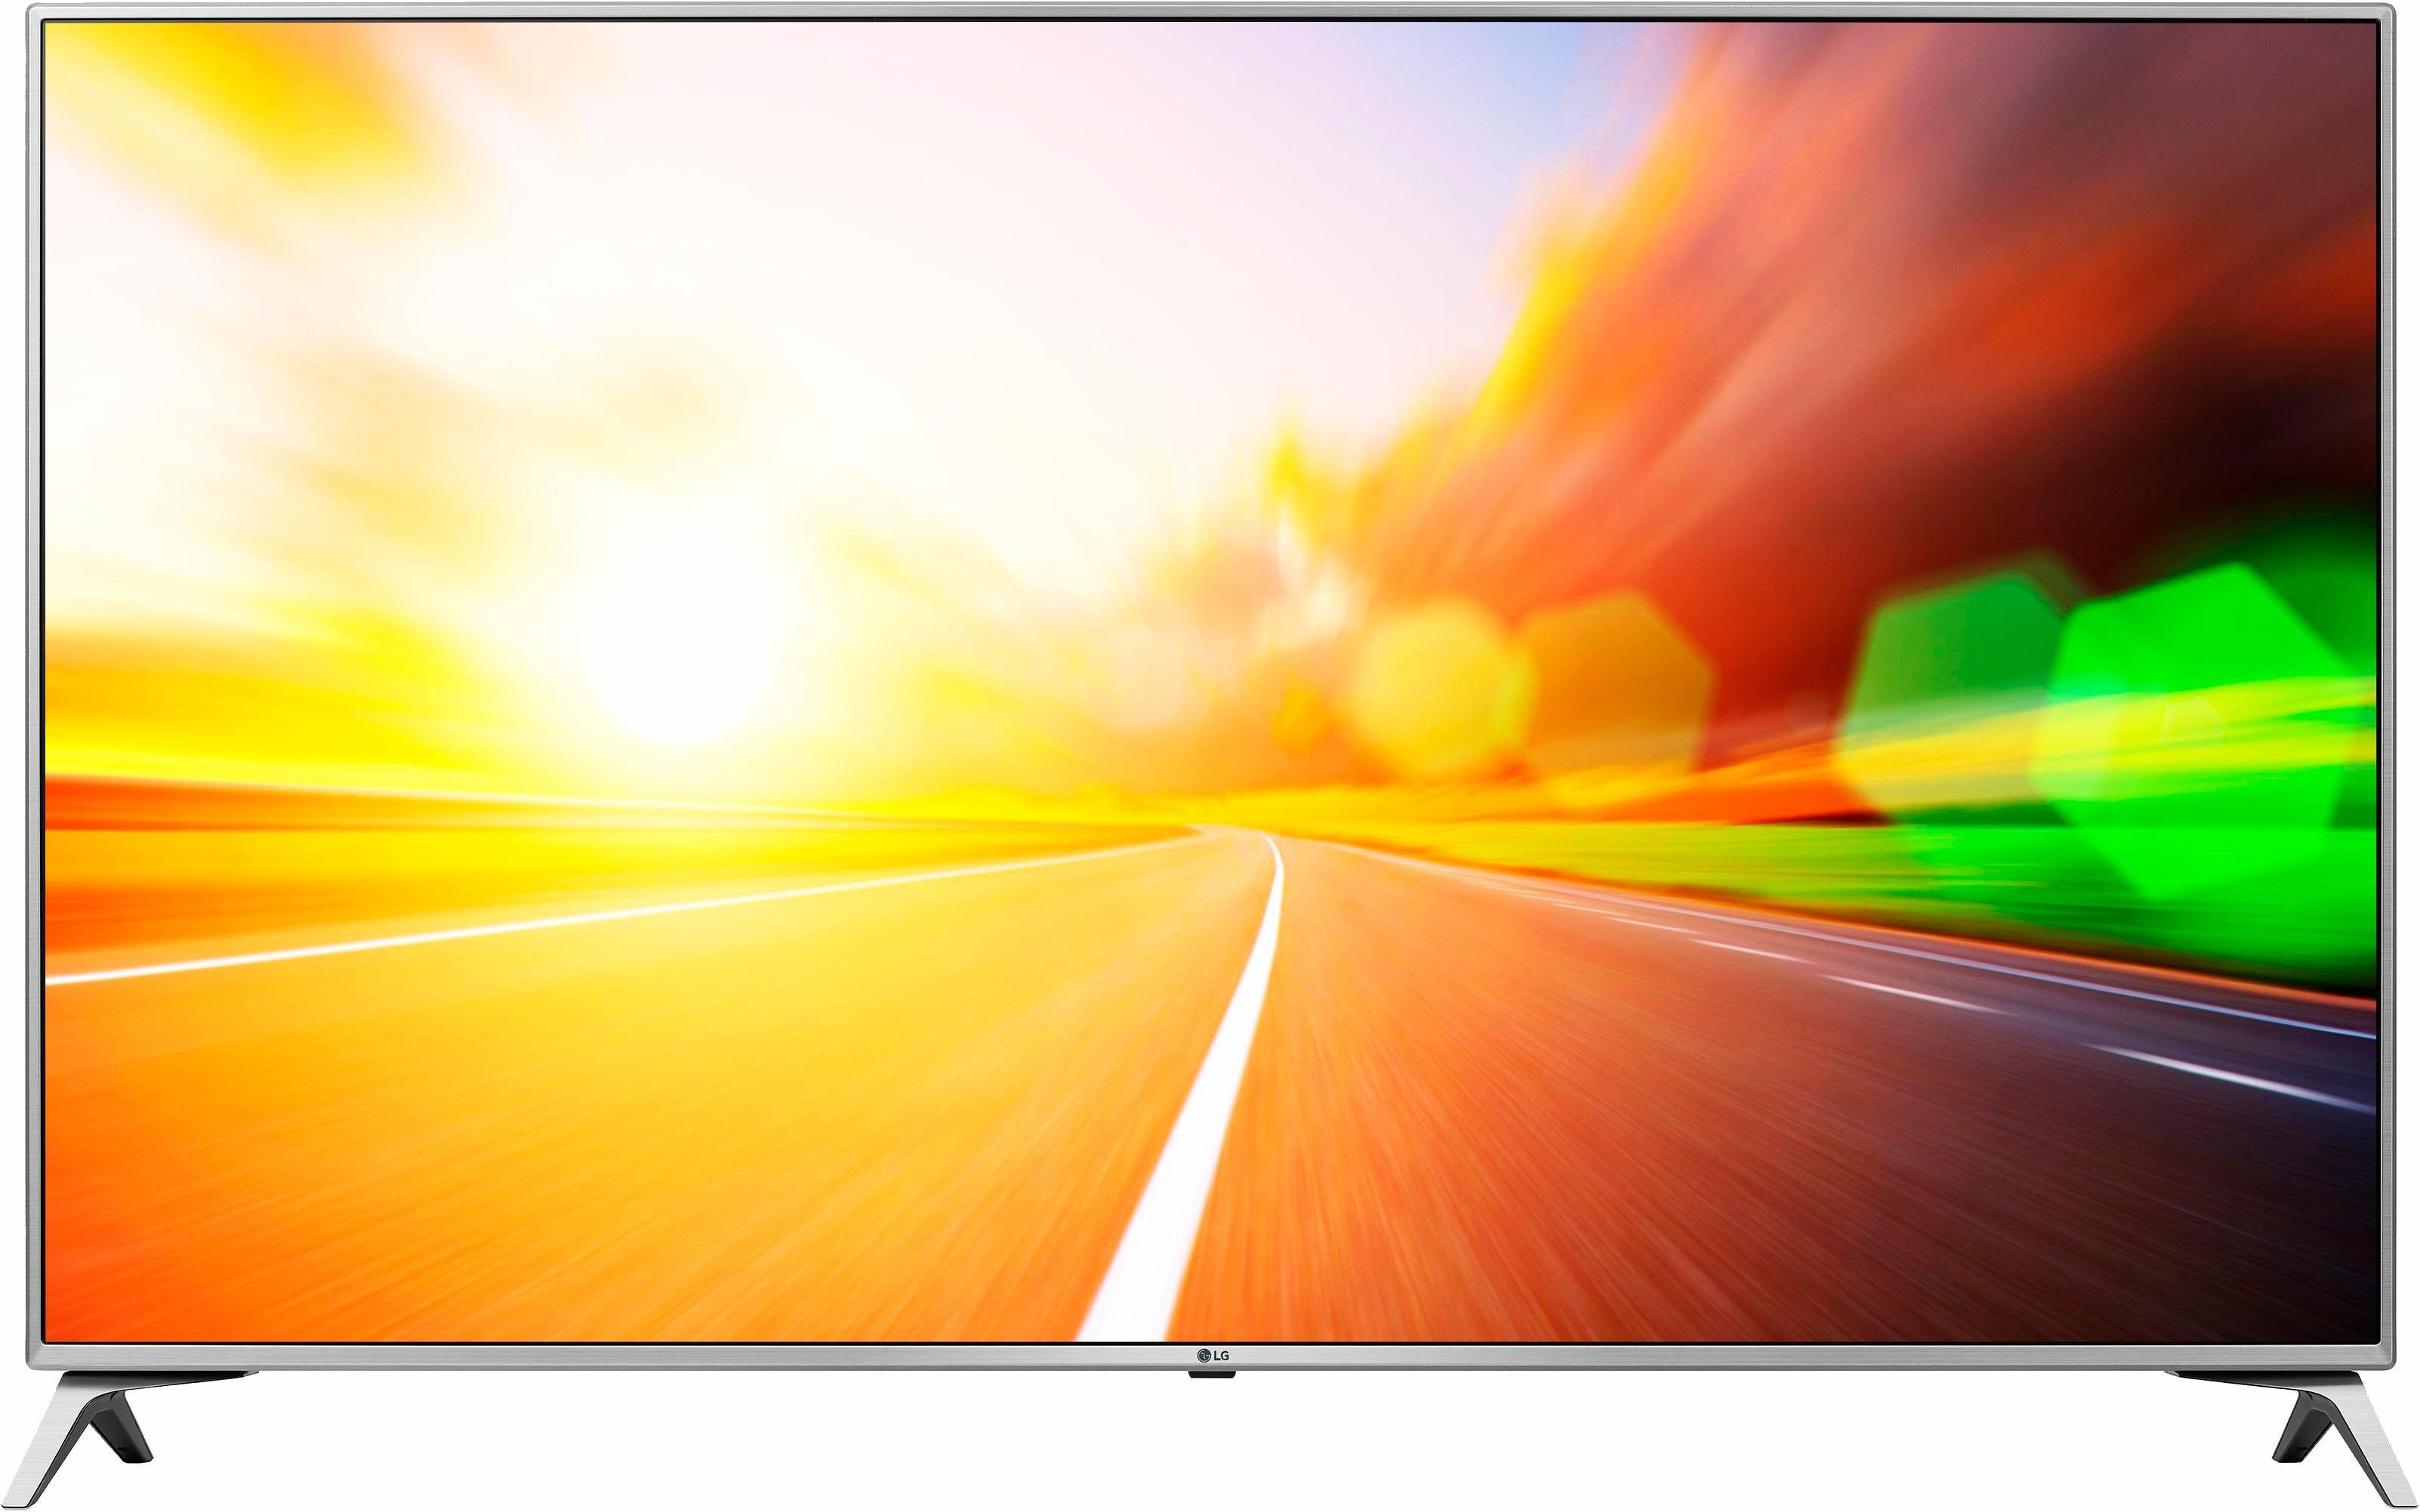 LG 49UJ6519 LED Fernseher (123 cm / 49 Zoll, UHD/4K, Smart-TV)